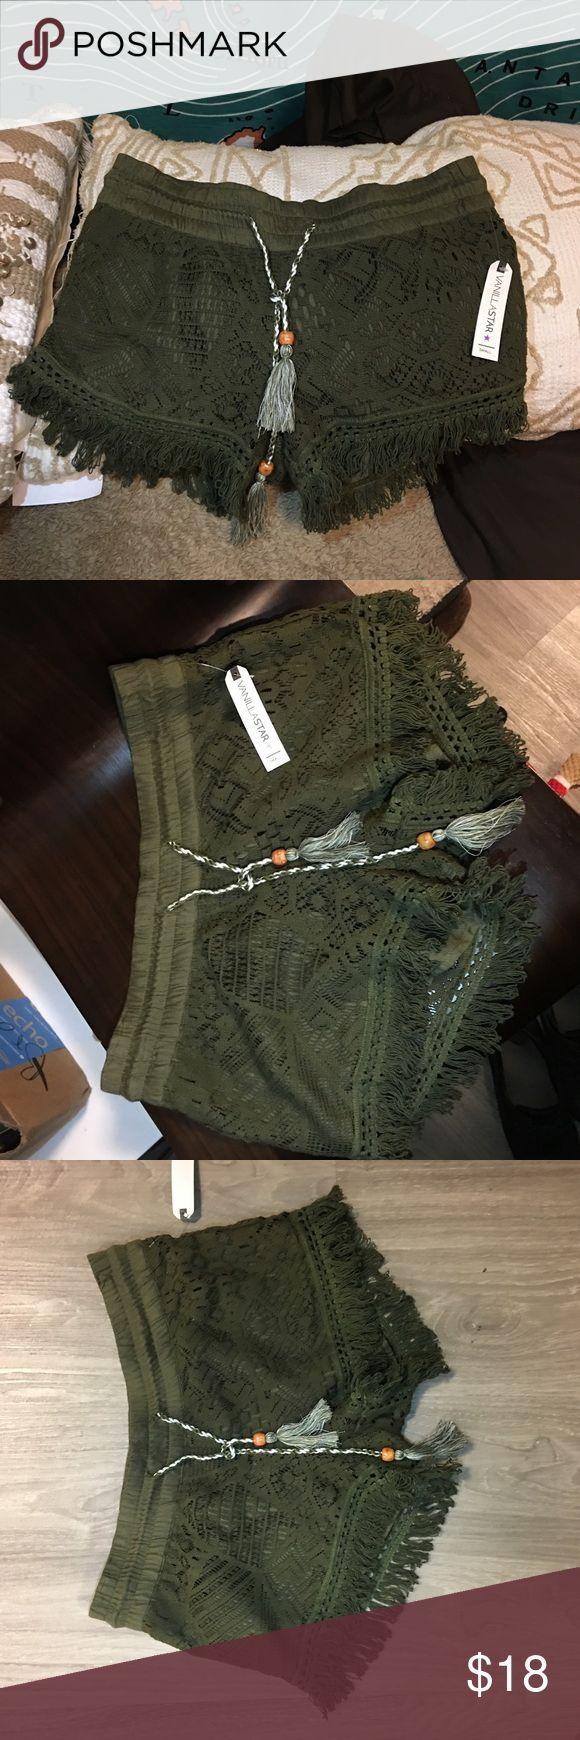 Army Green Boho Shorts Cute boho army green shorts. Size small never been worn Shorts